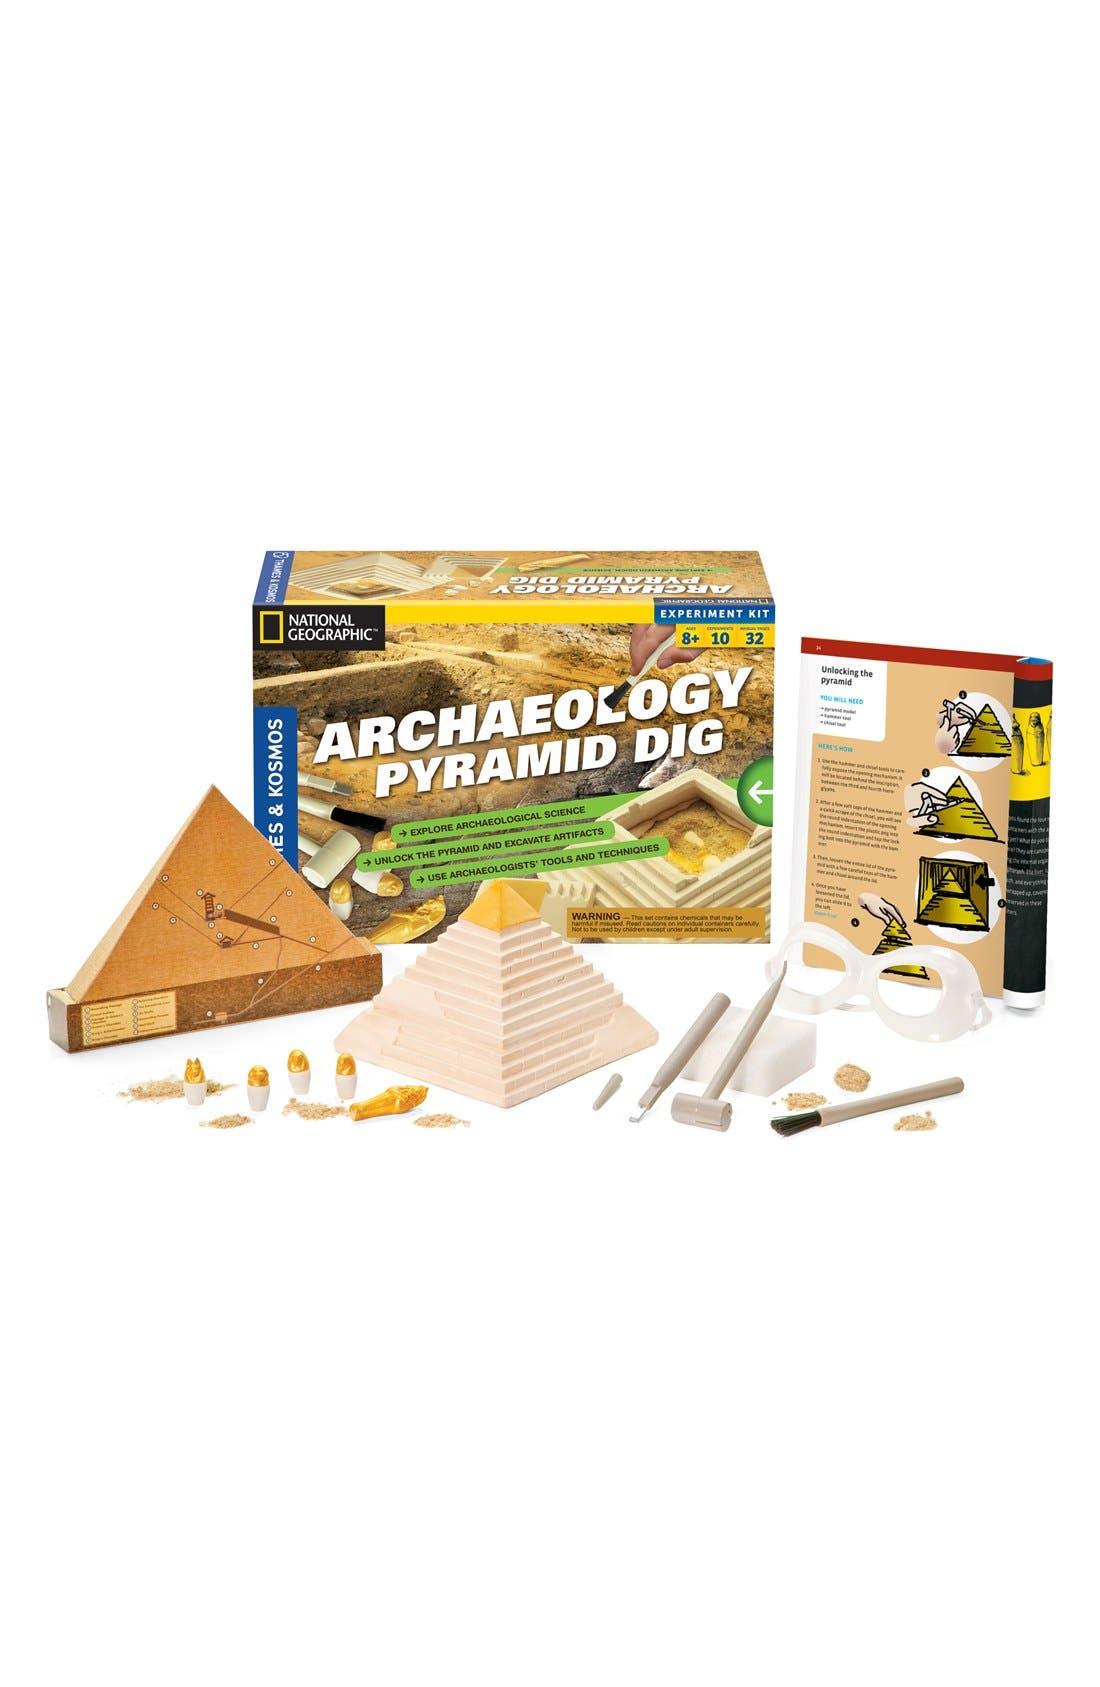 'Archaeology: Pyramid Dig 2.0' Play Kit,                         Main,                         color, 000